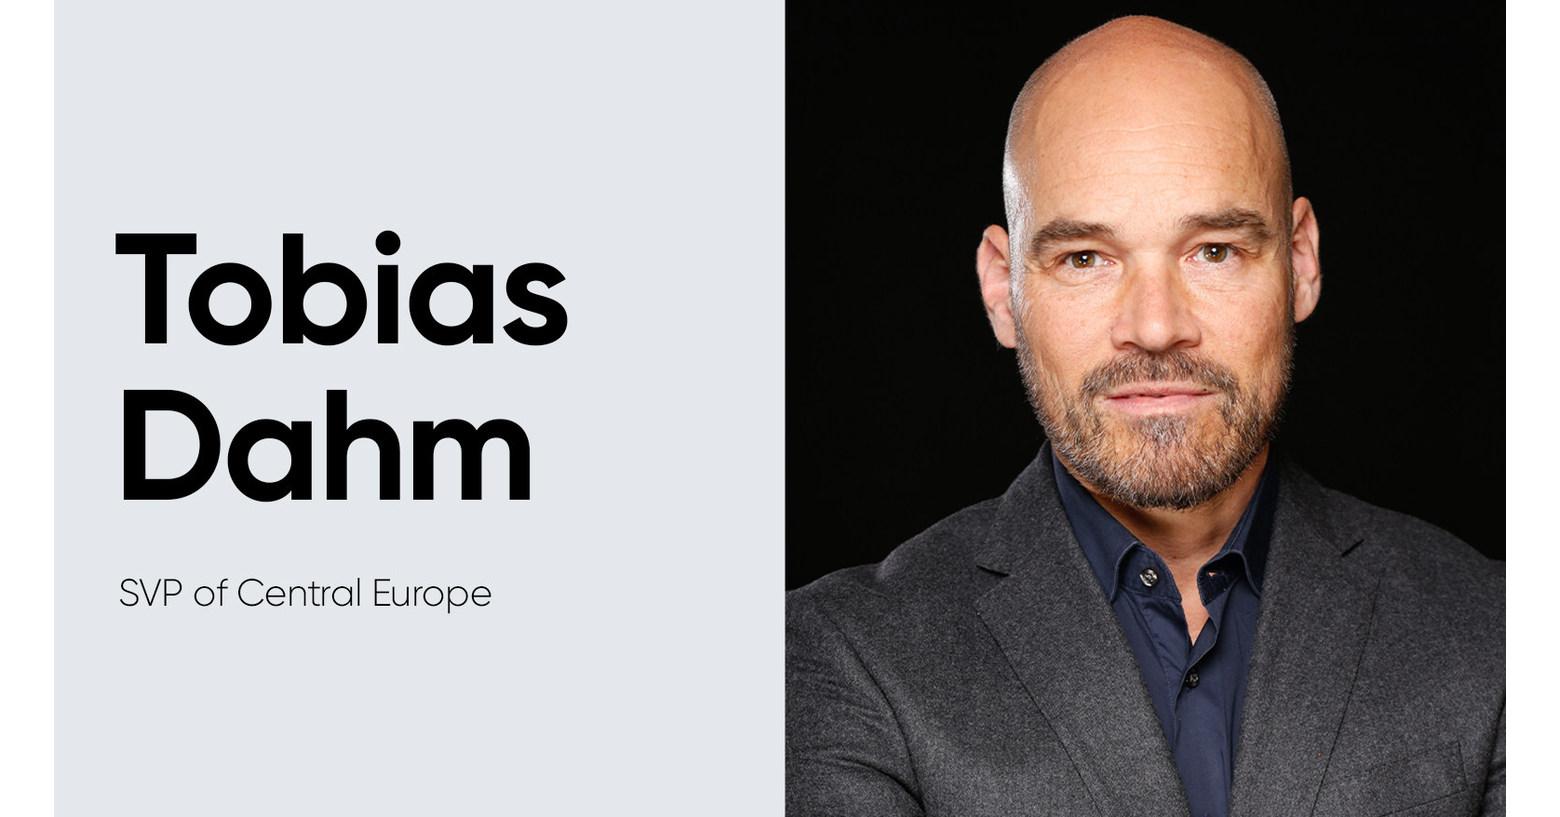 Yext Hires Salesforce Veteran Tobias Dahm as SVP, Central Europe